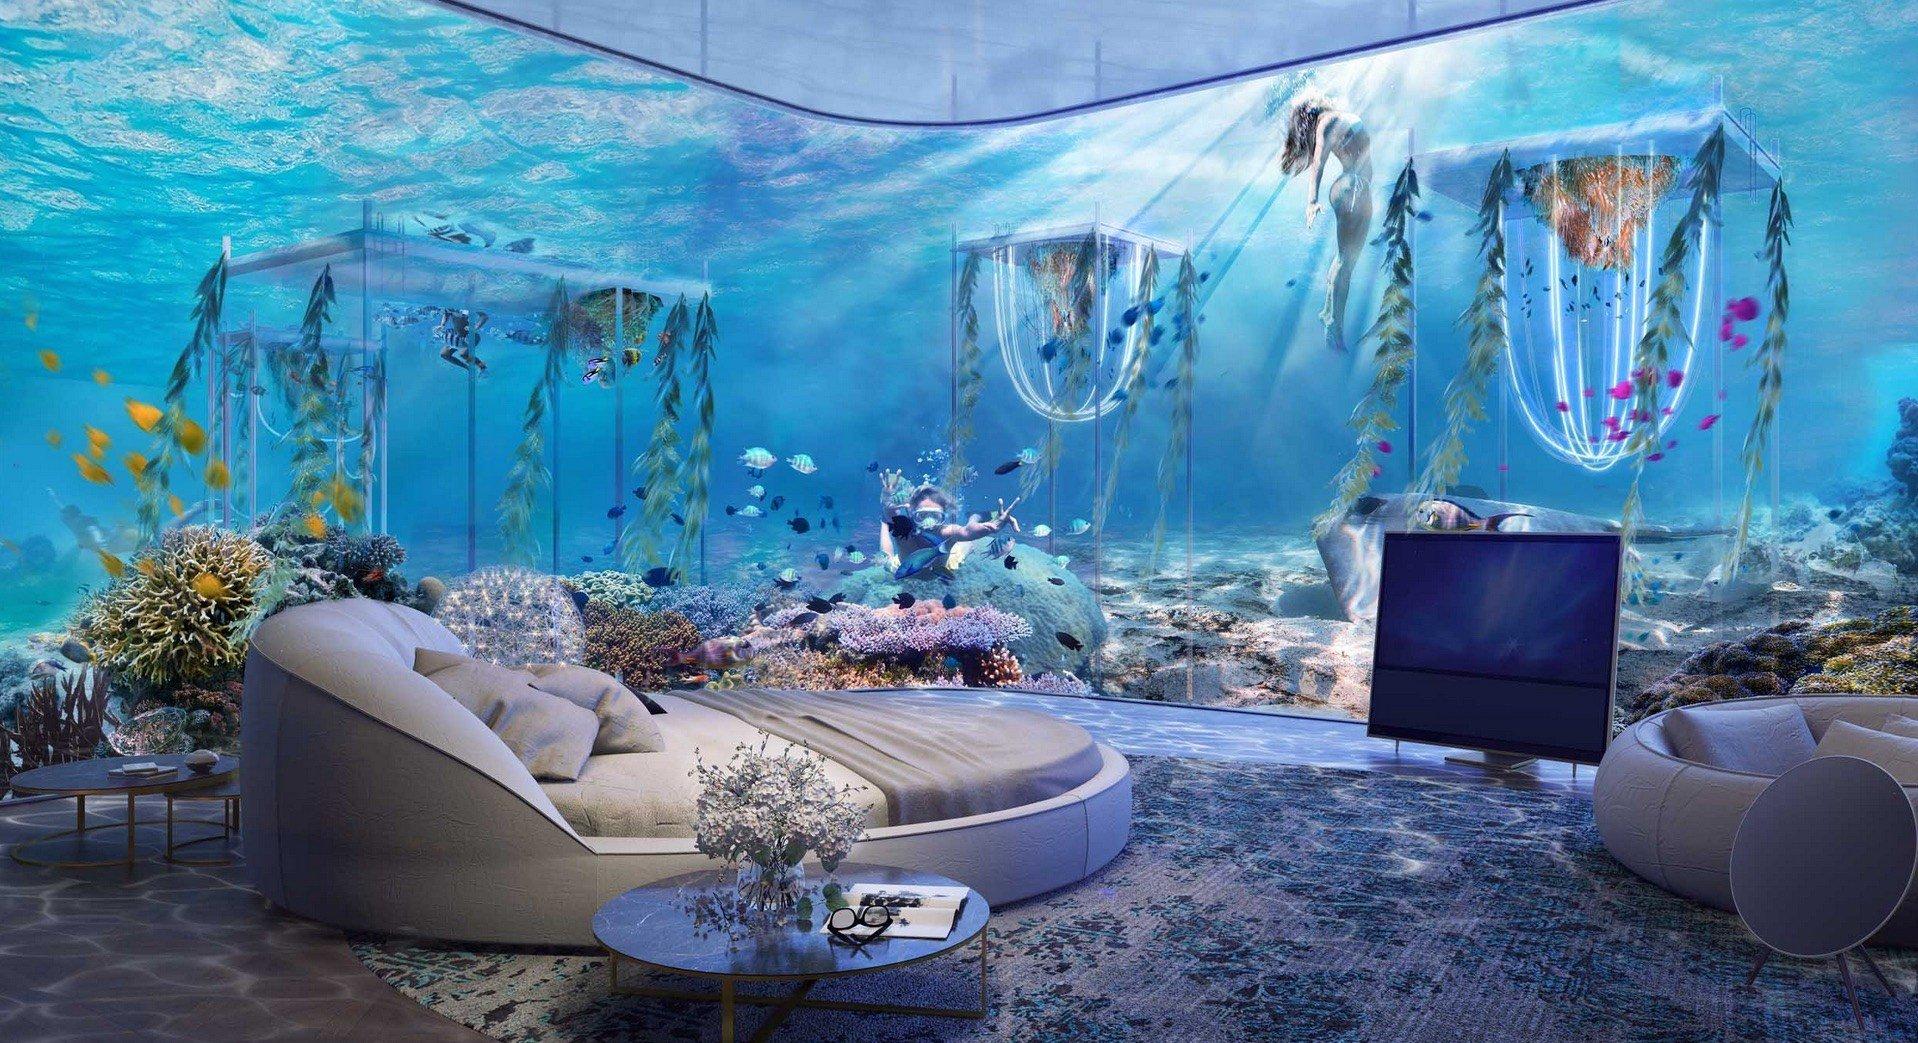 The World's First Underwater Luxury Vessel Resort will open in Dubai